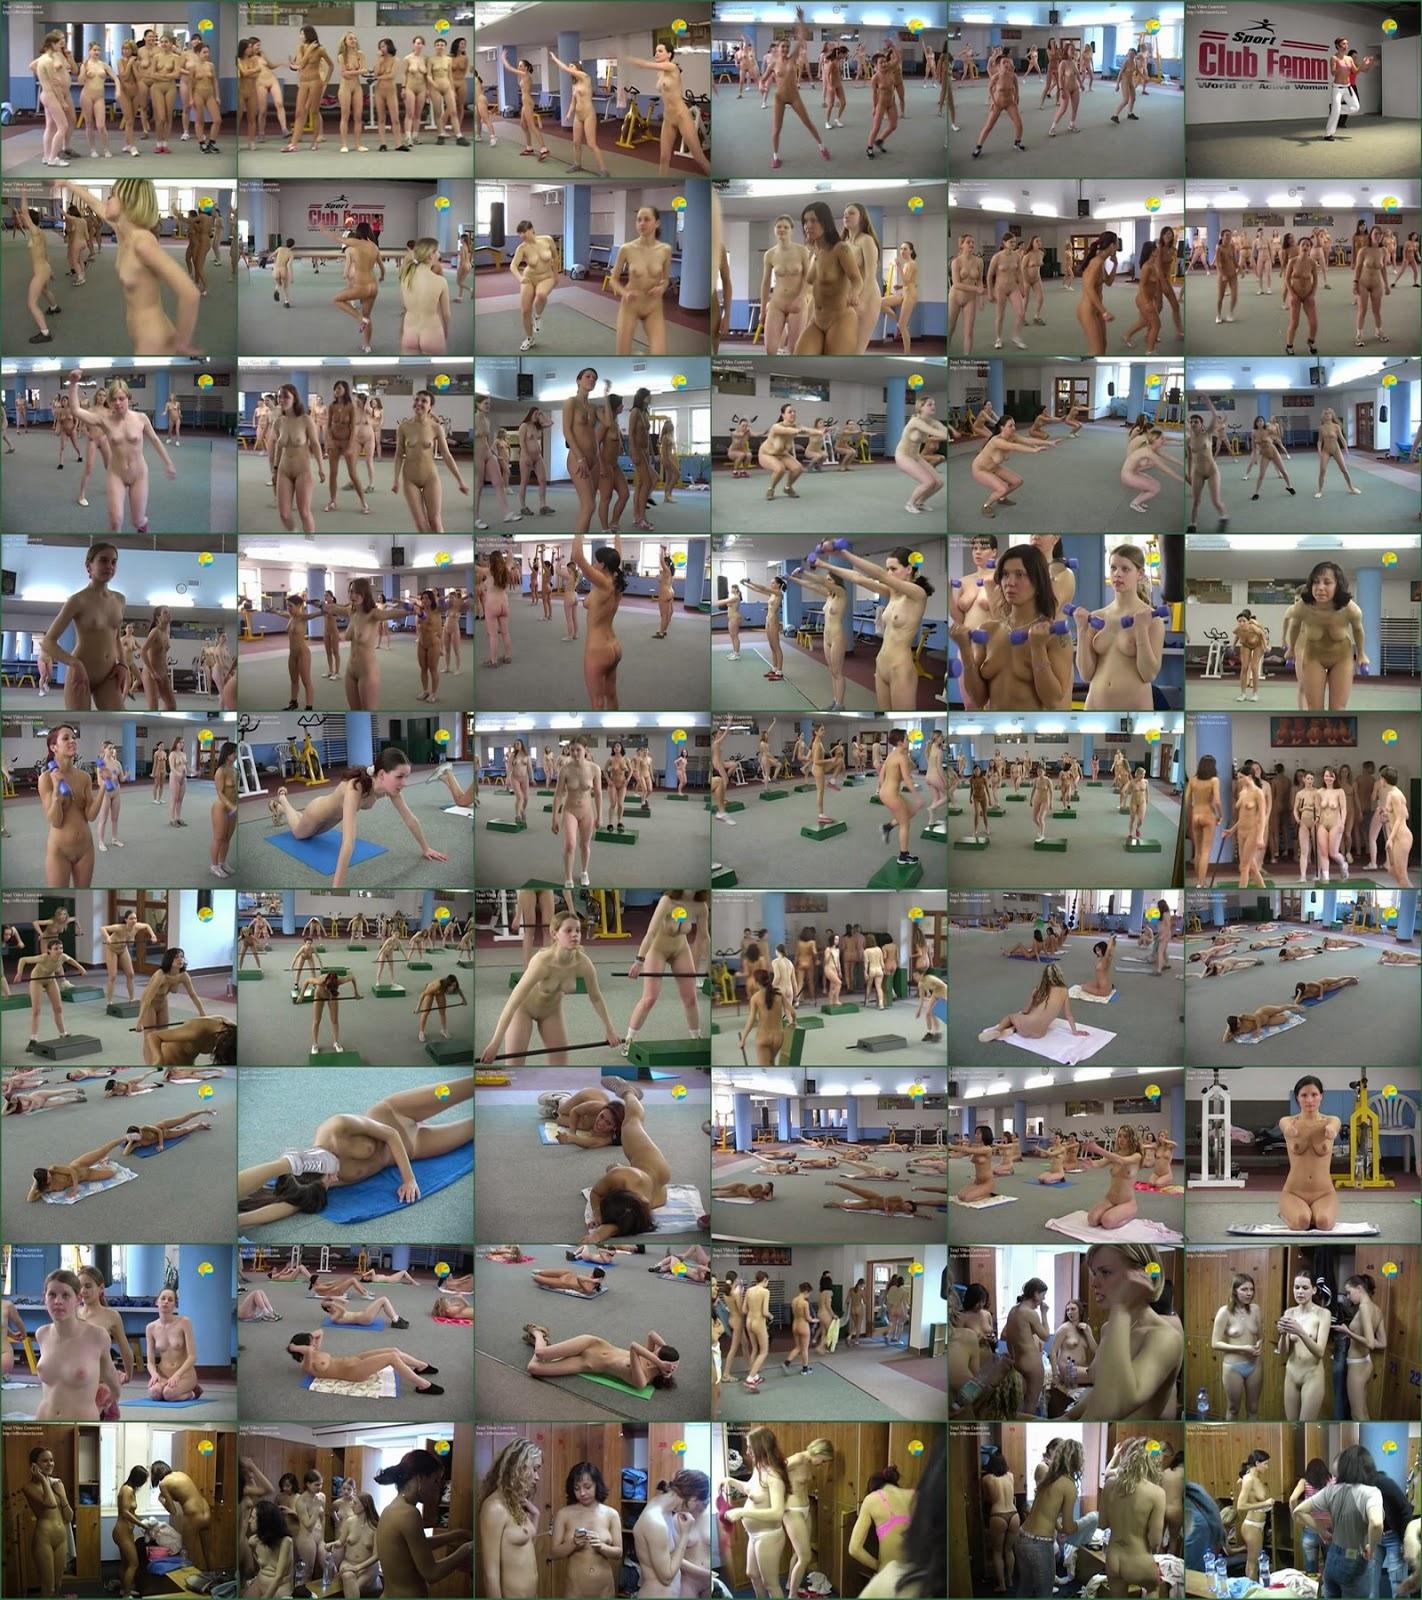 танец живота в голом виде фото